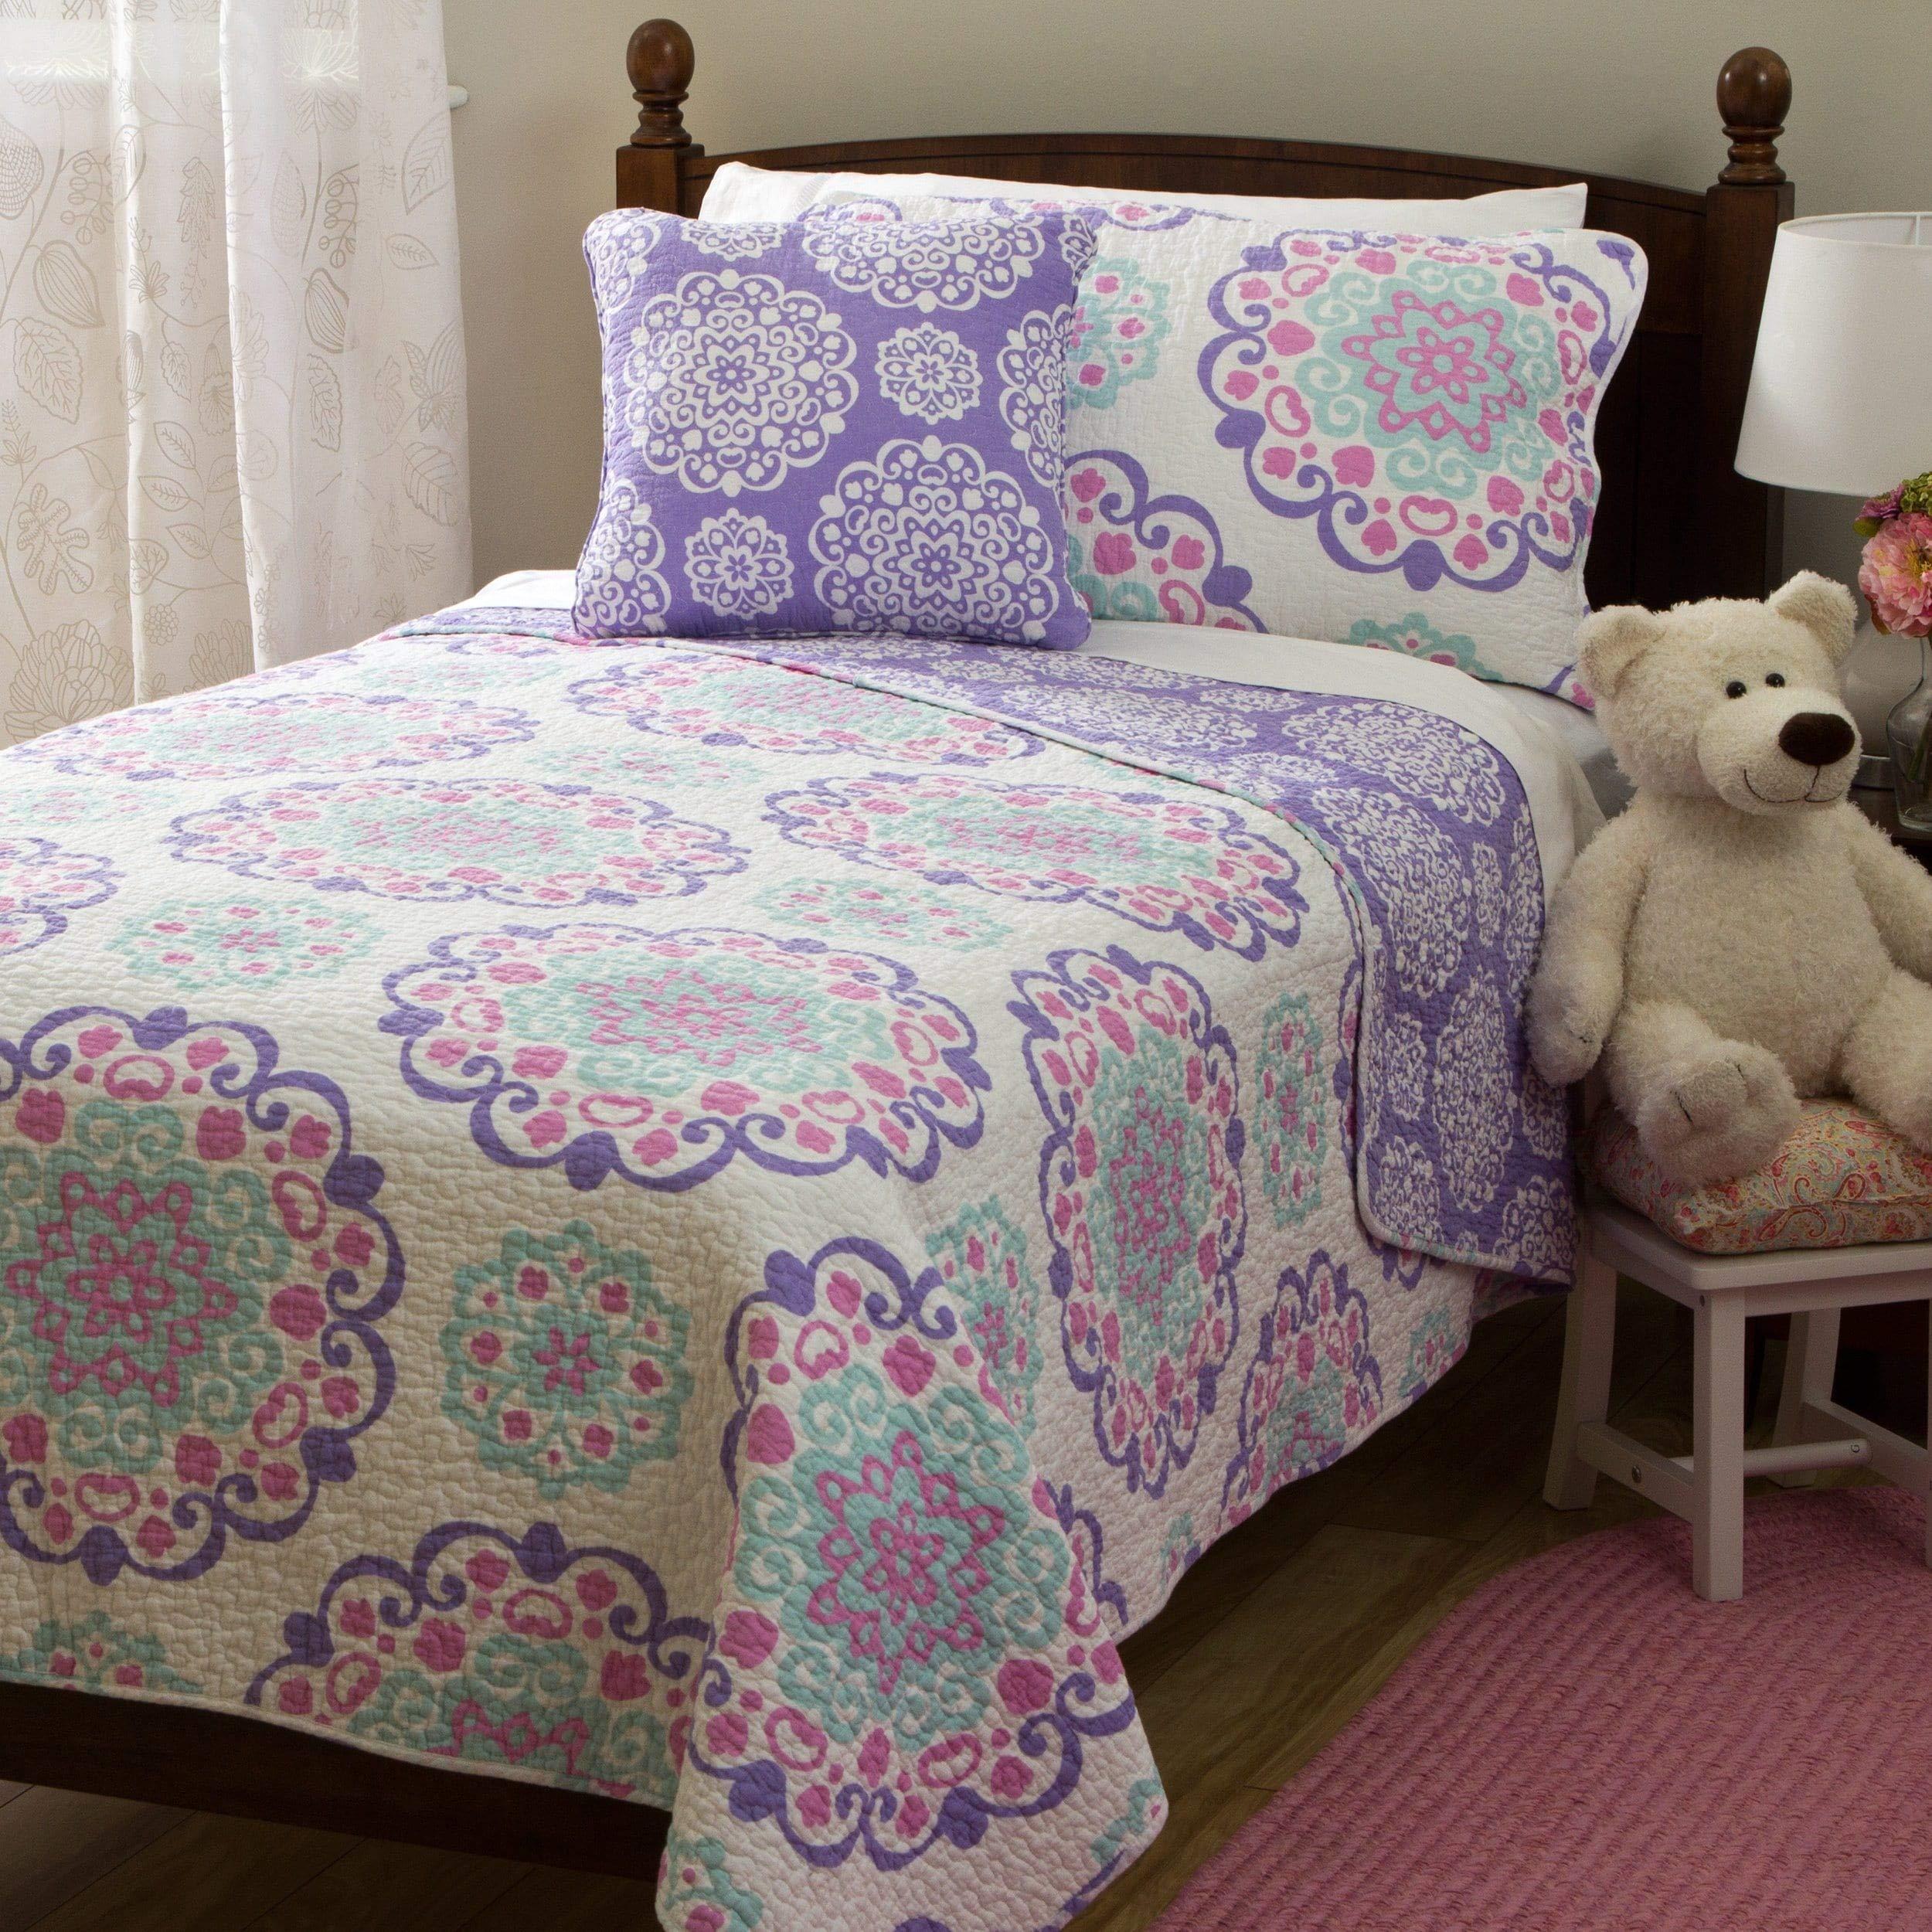 Design Studio Vivian 4-Piece Quilt Set Medallion, Bohemian Cotton, Reversible Bedding, Teen, Girls, Full, Purple by Design Studio